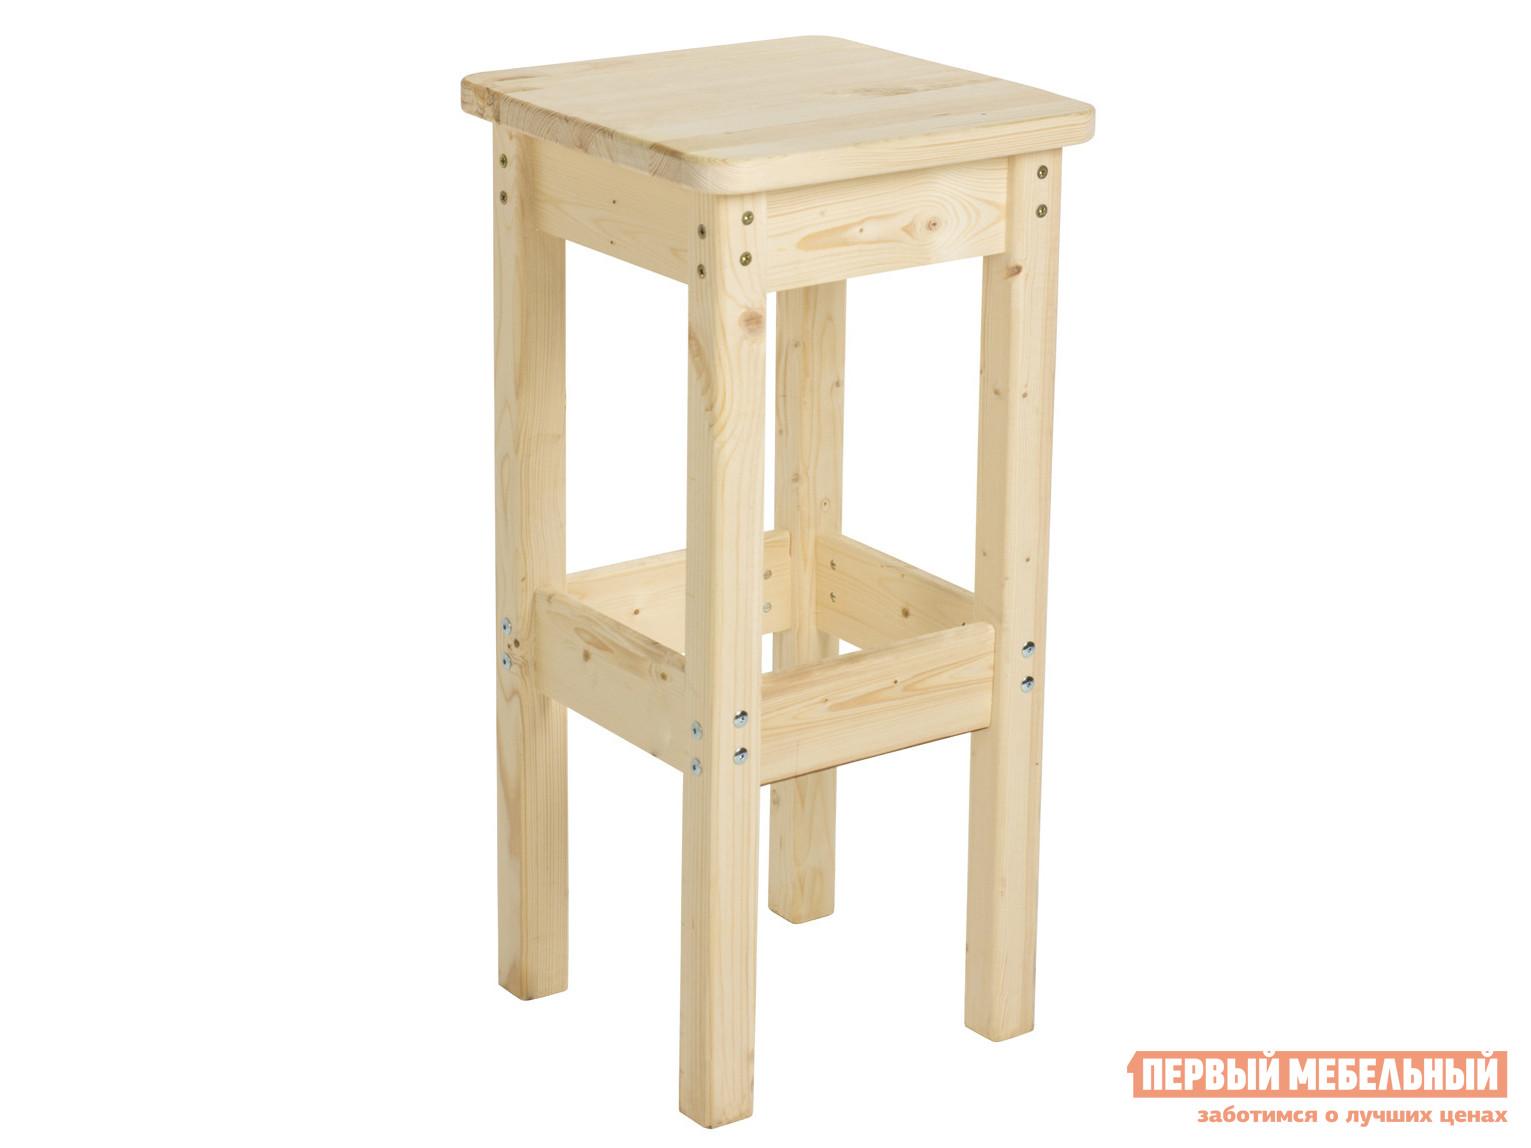 Барный стул Green mebel Барный стул 400х400 высота 80 см барный стул weekend bw